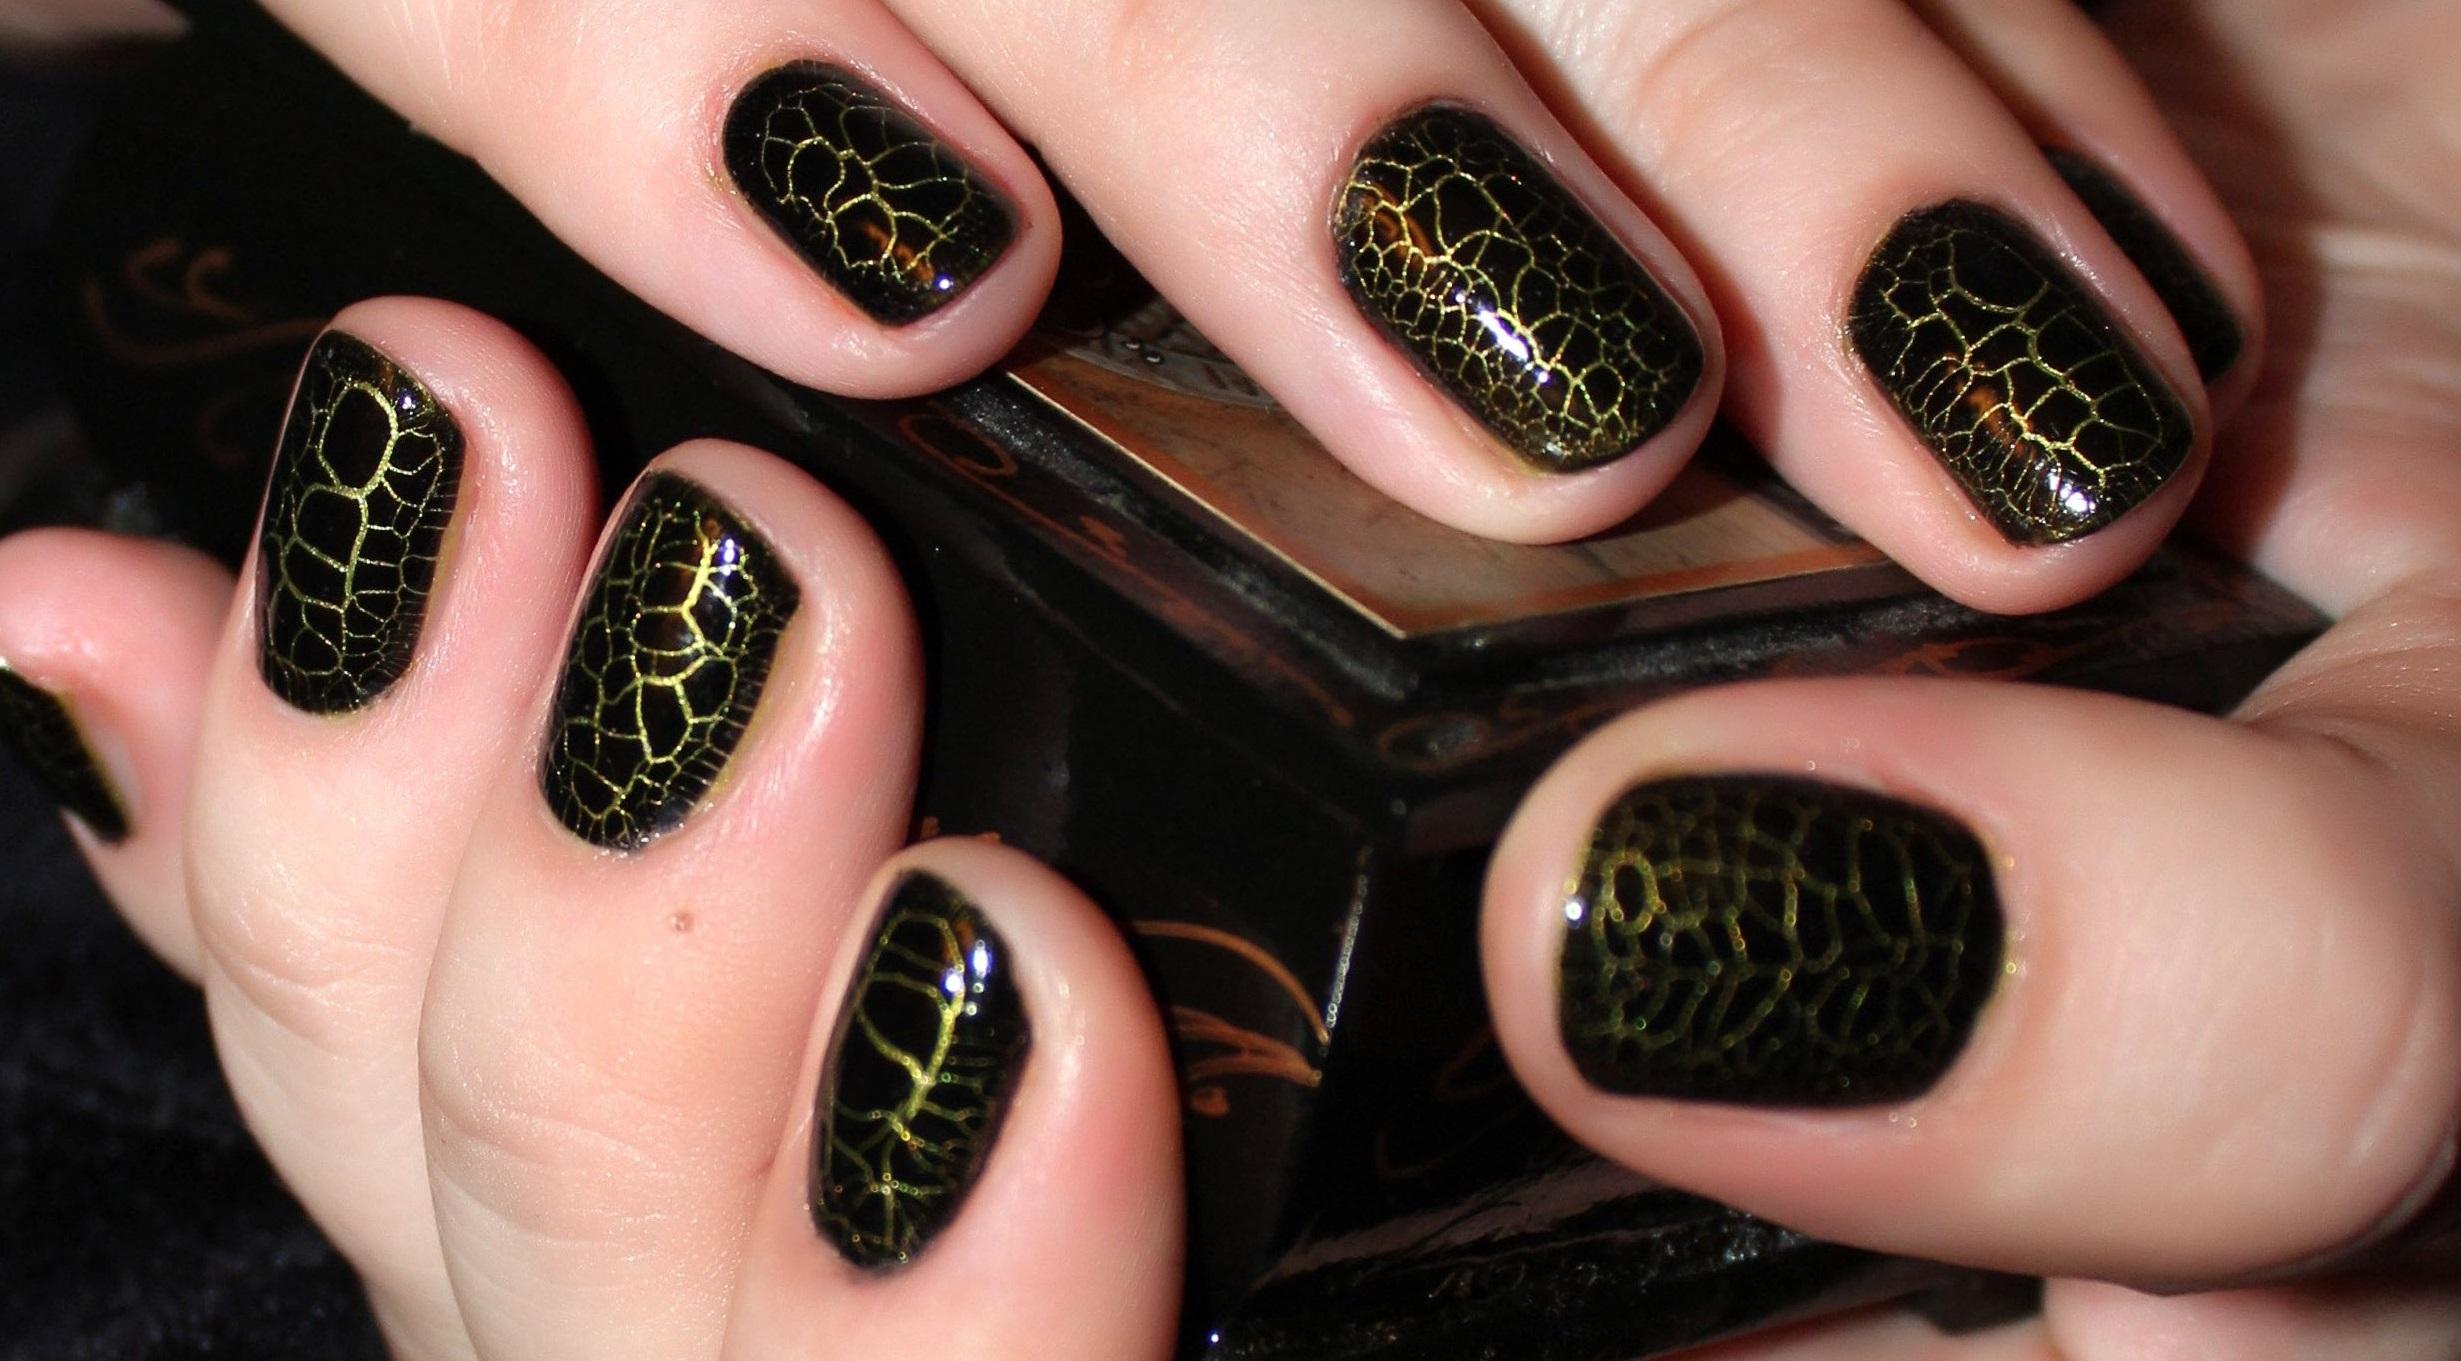 Контрастный дизайн ногтей лаком кракелюр